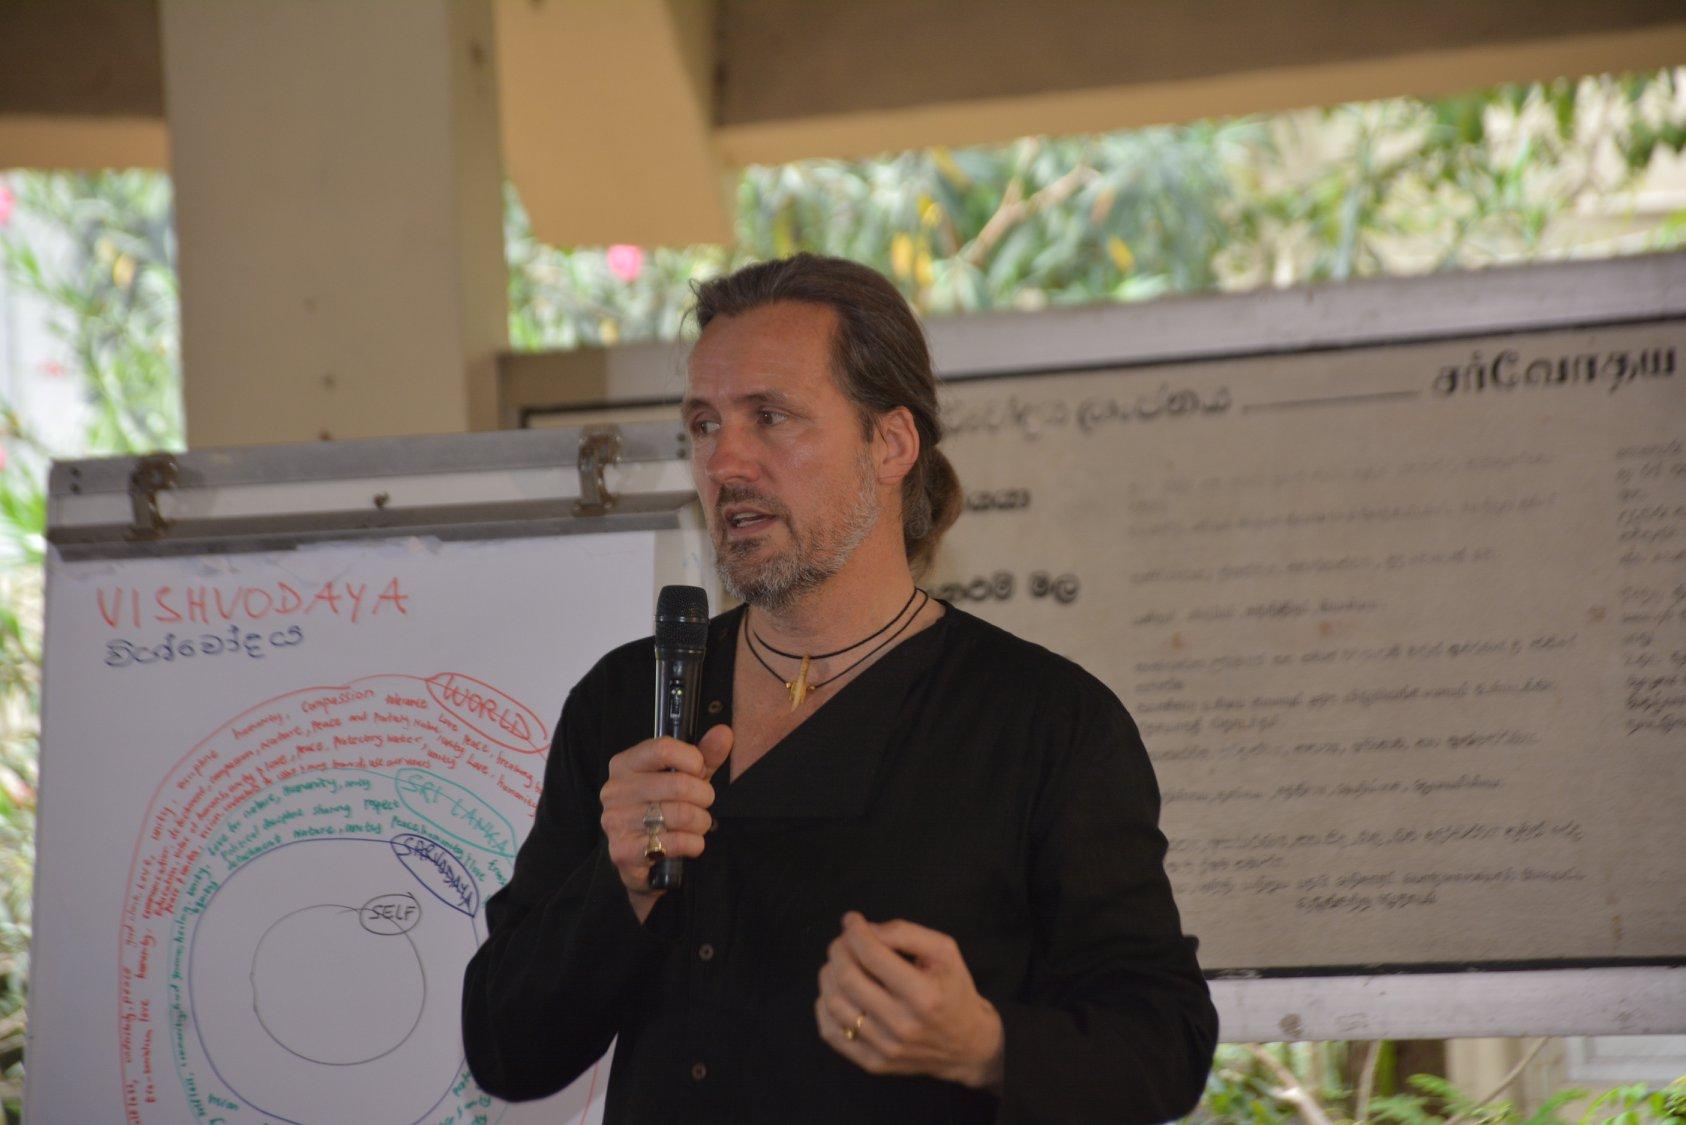 Transformative Education and Society Building: Integral Keynote at Sarvodaya's Headquarters, Sri Lanka